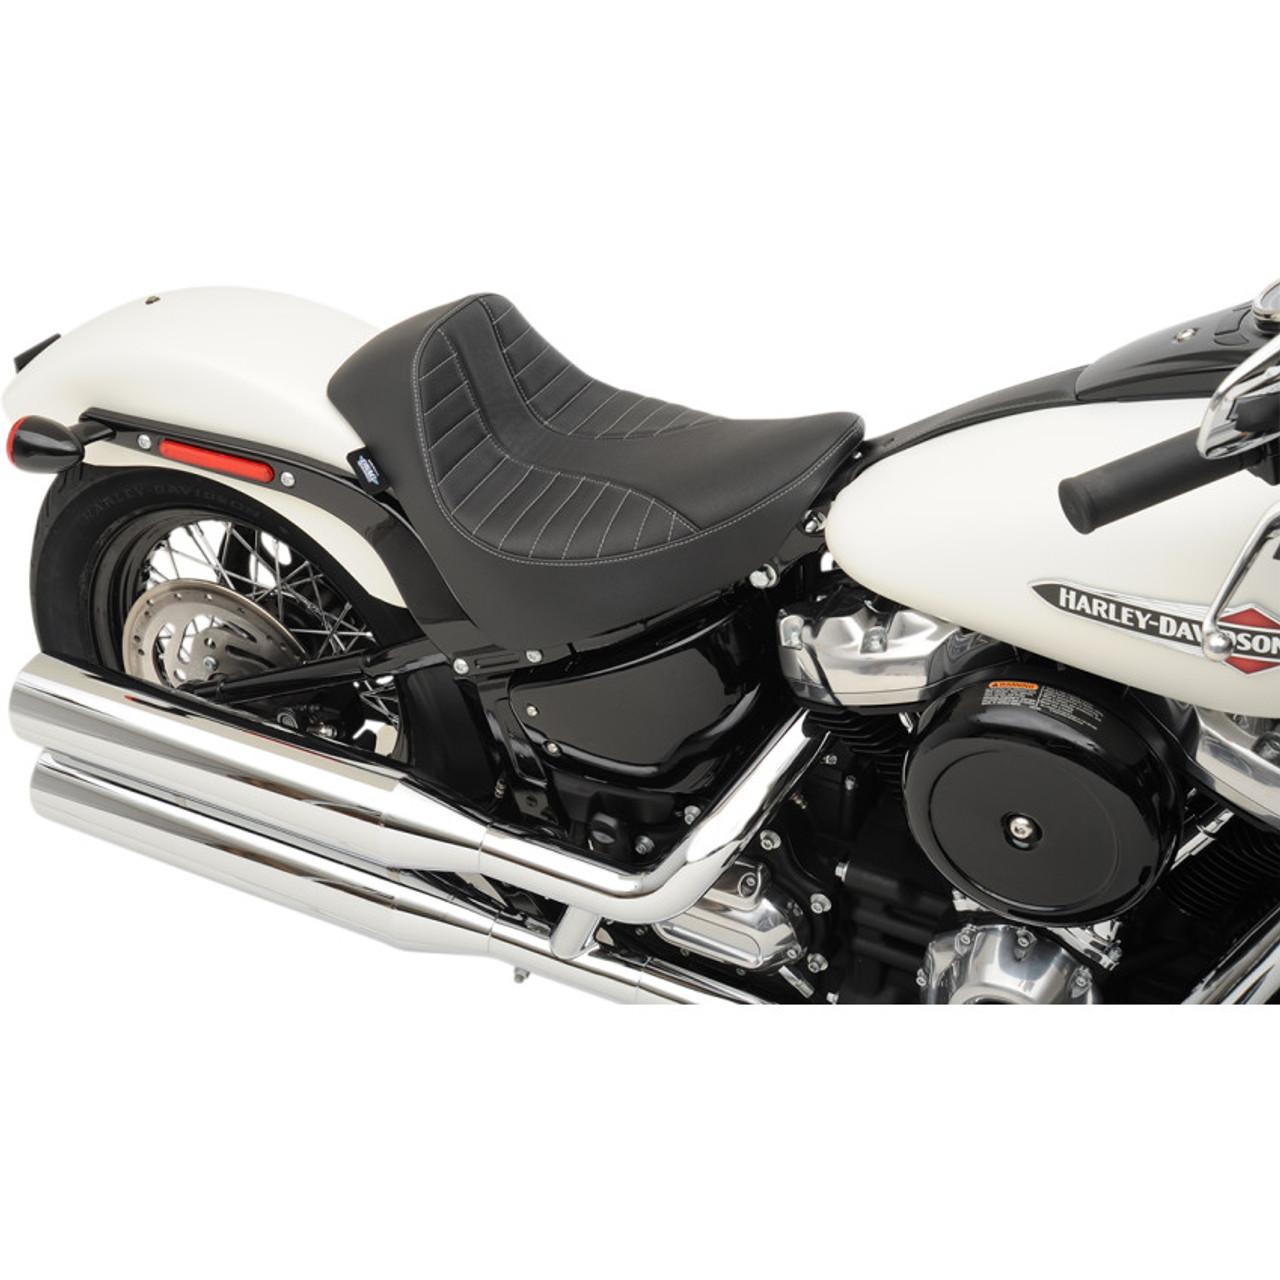 a31ecc3ec8da1 Drag Specialties EZ-On Solo Seat for 2018-2019 Harley Softail* - Scorpion  Silver Stitch